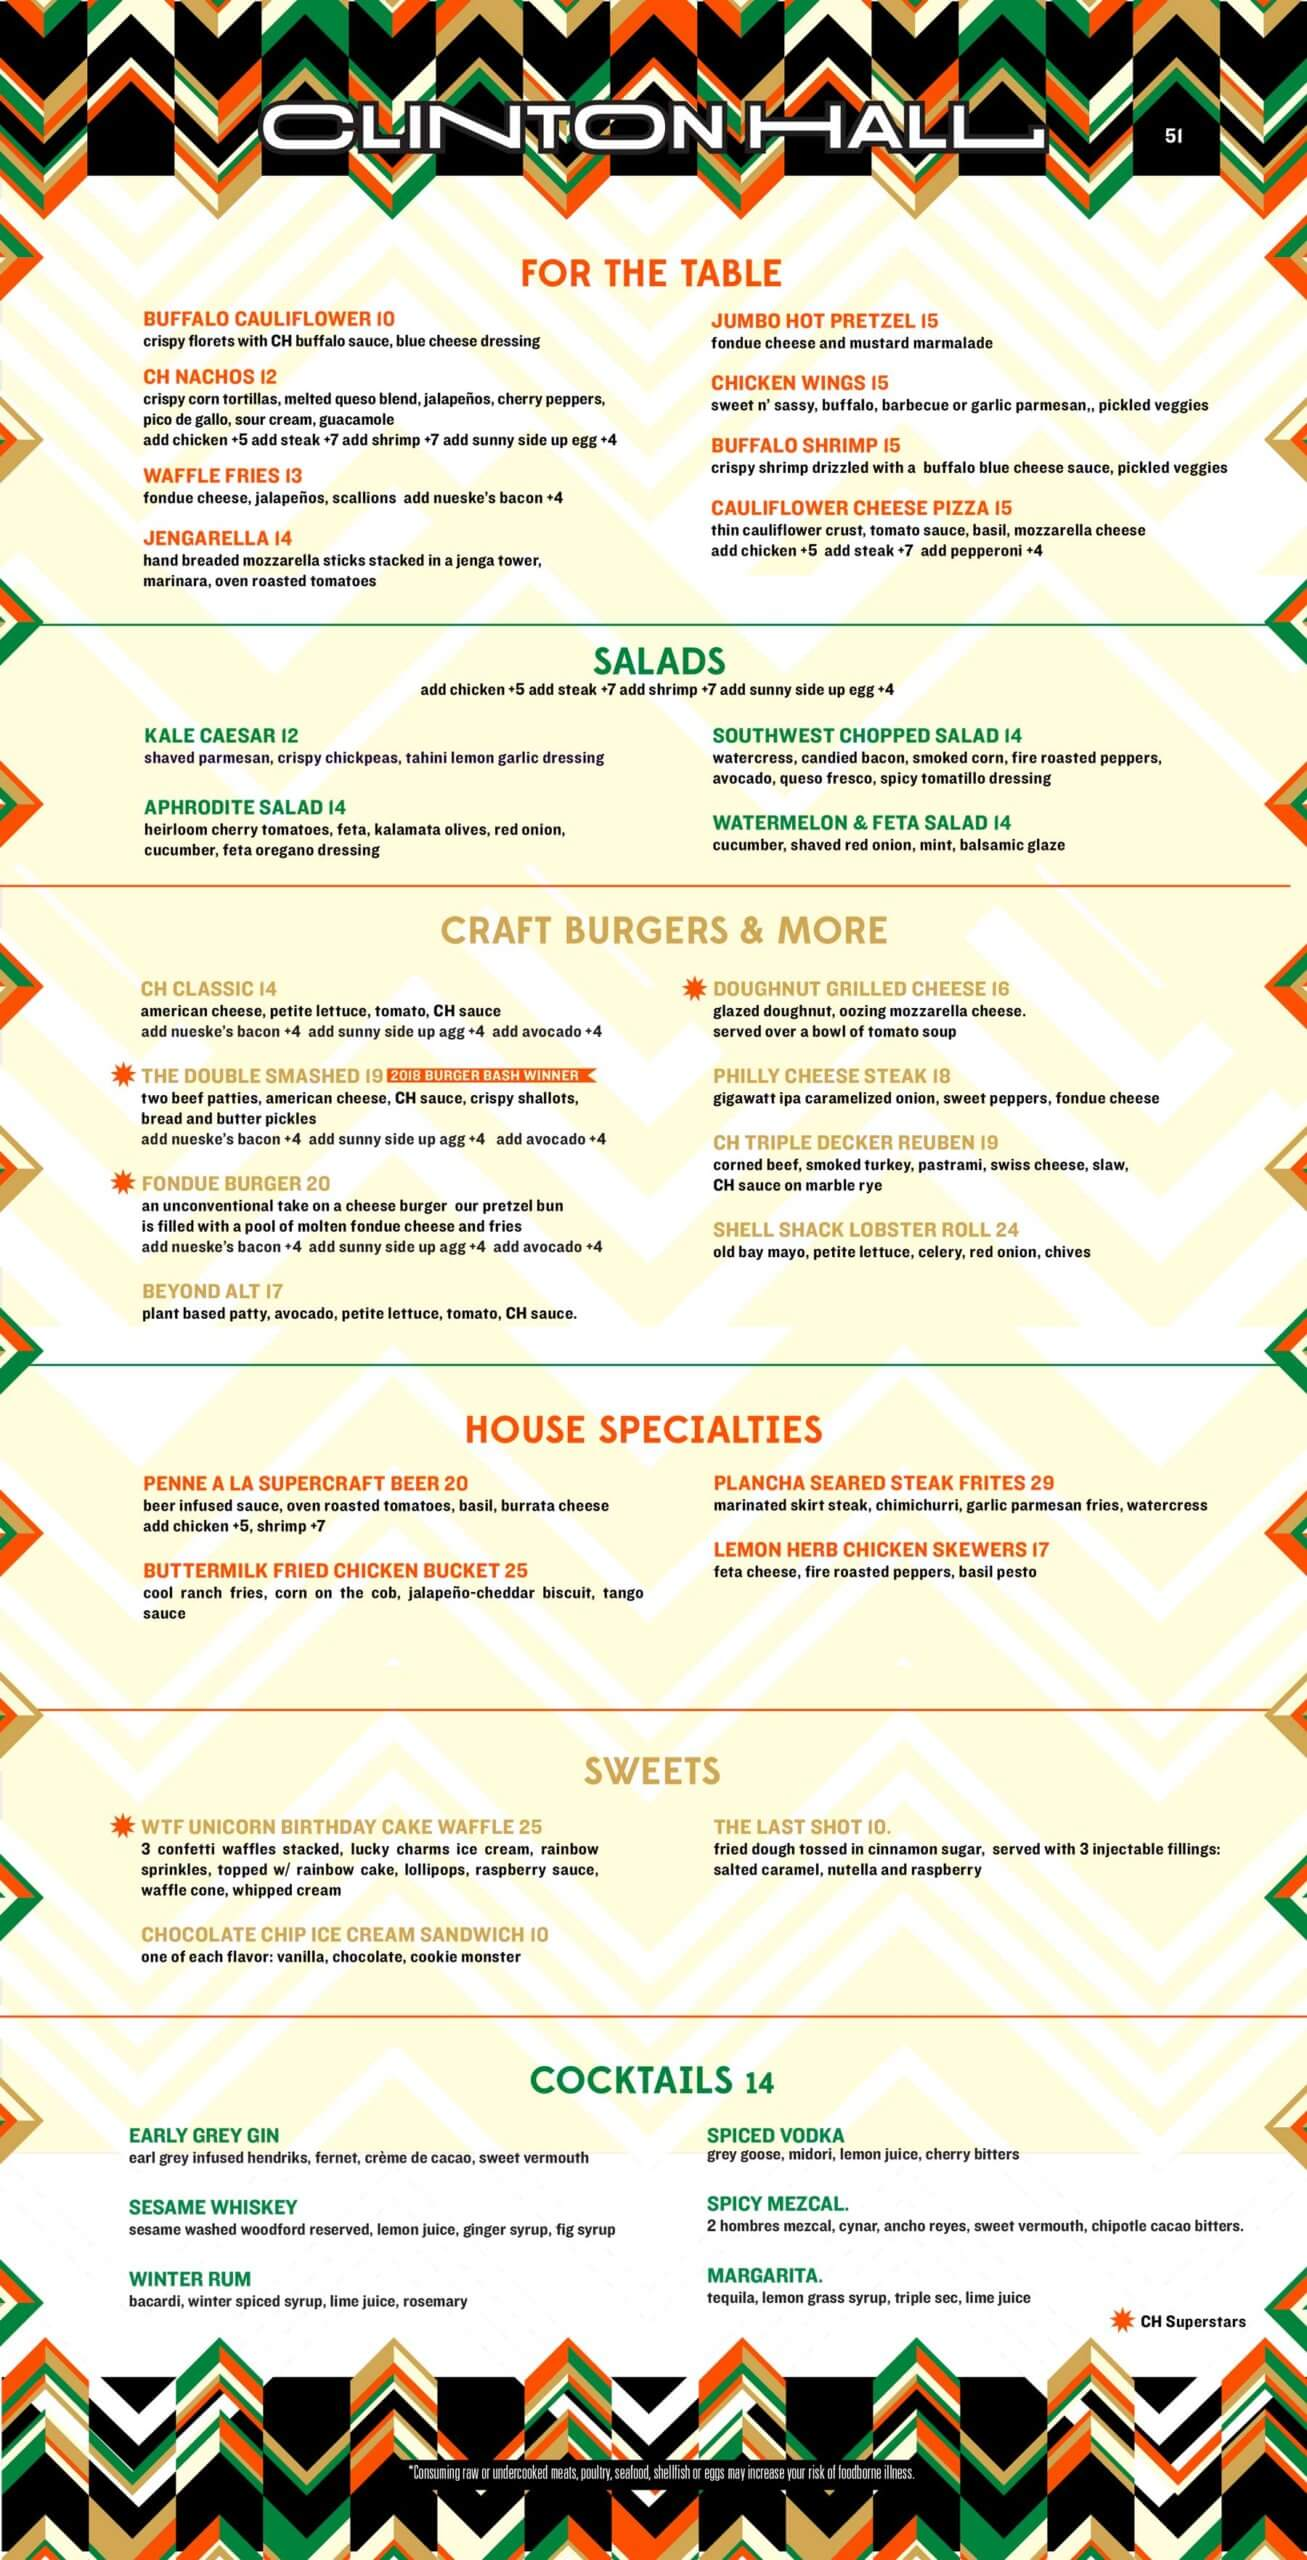 Clinton Hall 51 Food Menu